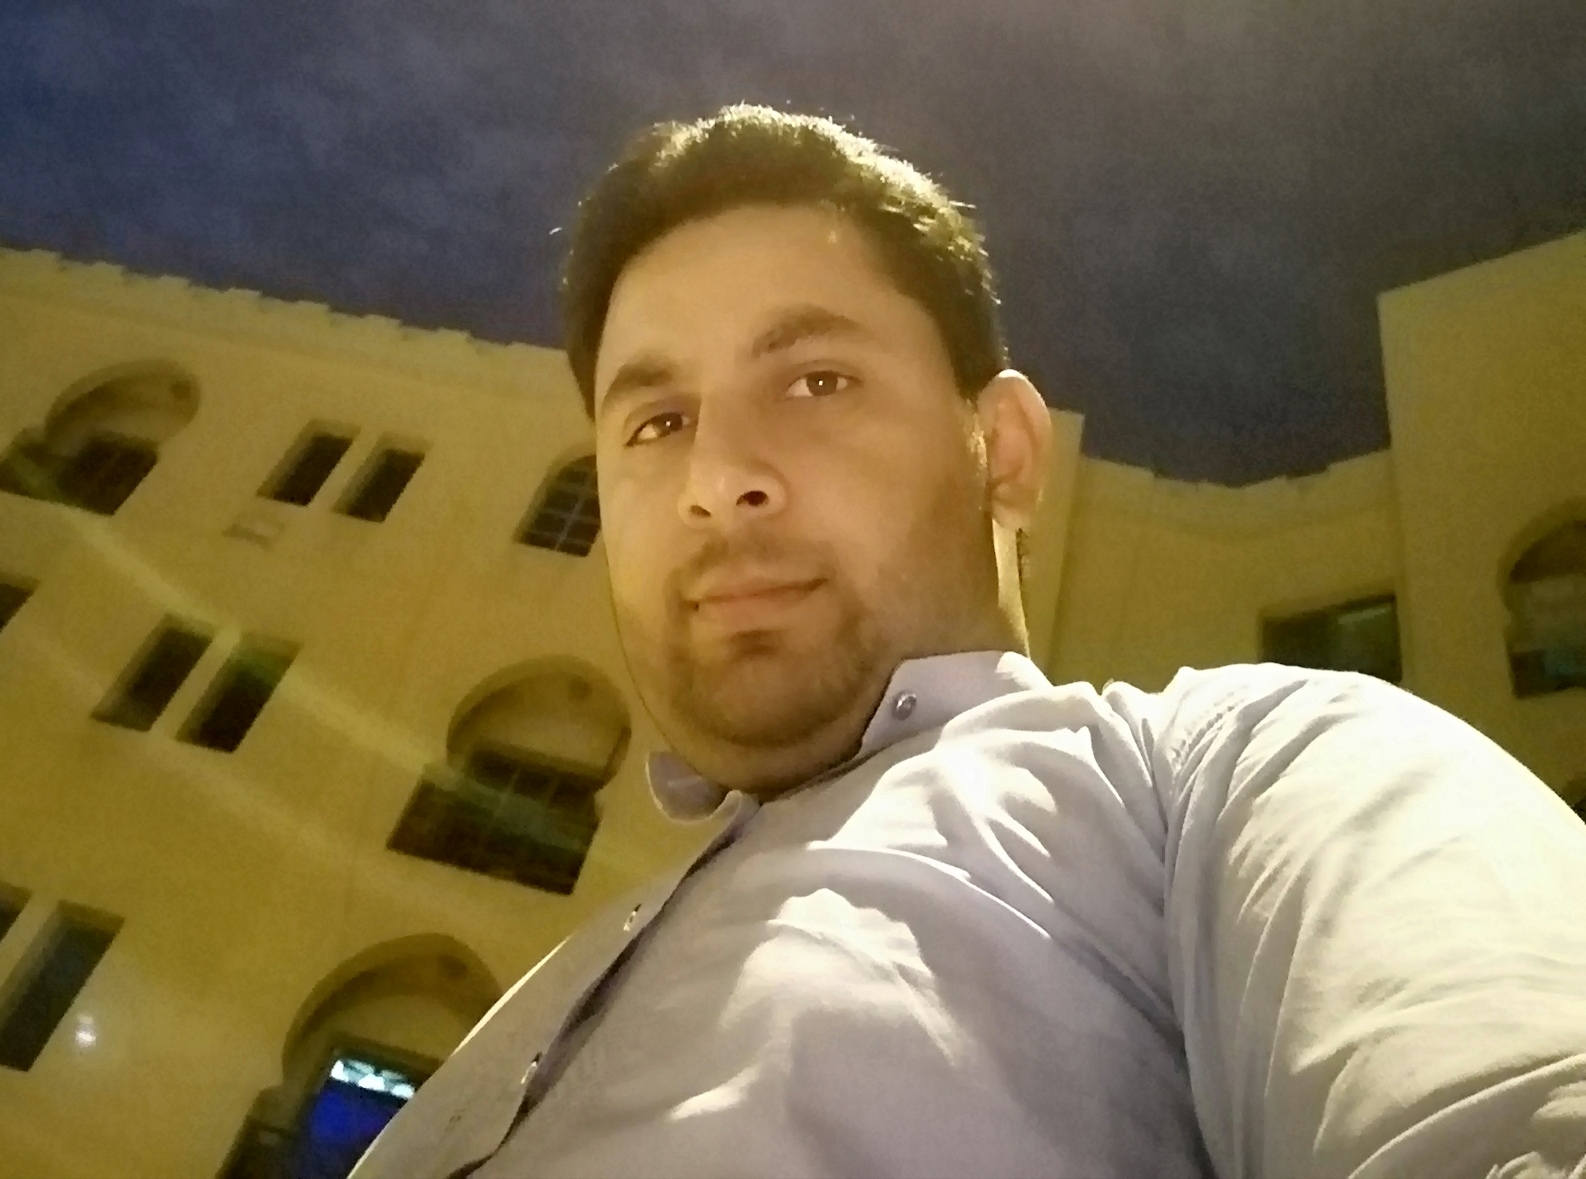 Islamiyat Excel, Data Entry, Air Conditioning, Sports Freelancer